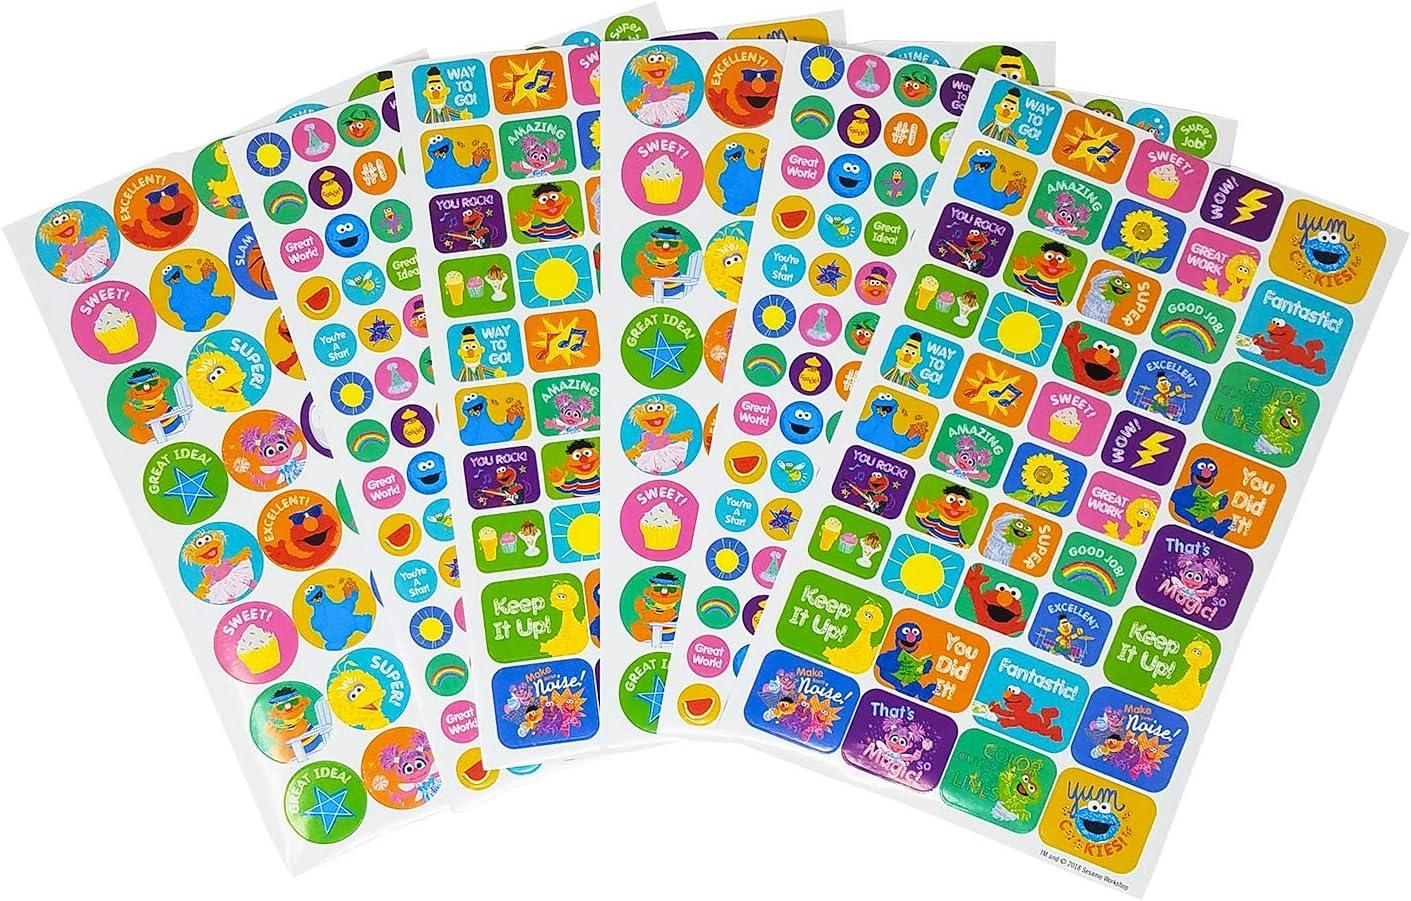 Sesame Street 400+ Fun & Reward Sticker Book, Motivational and Encouraging Stickers, 6 Sheets